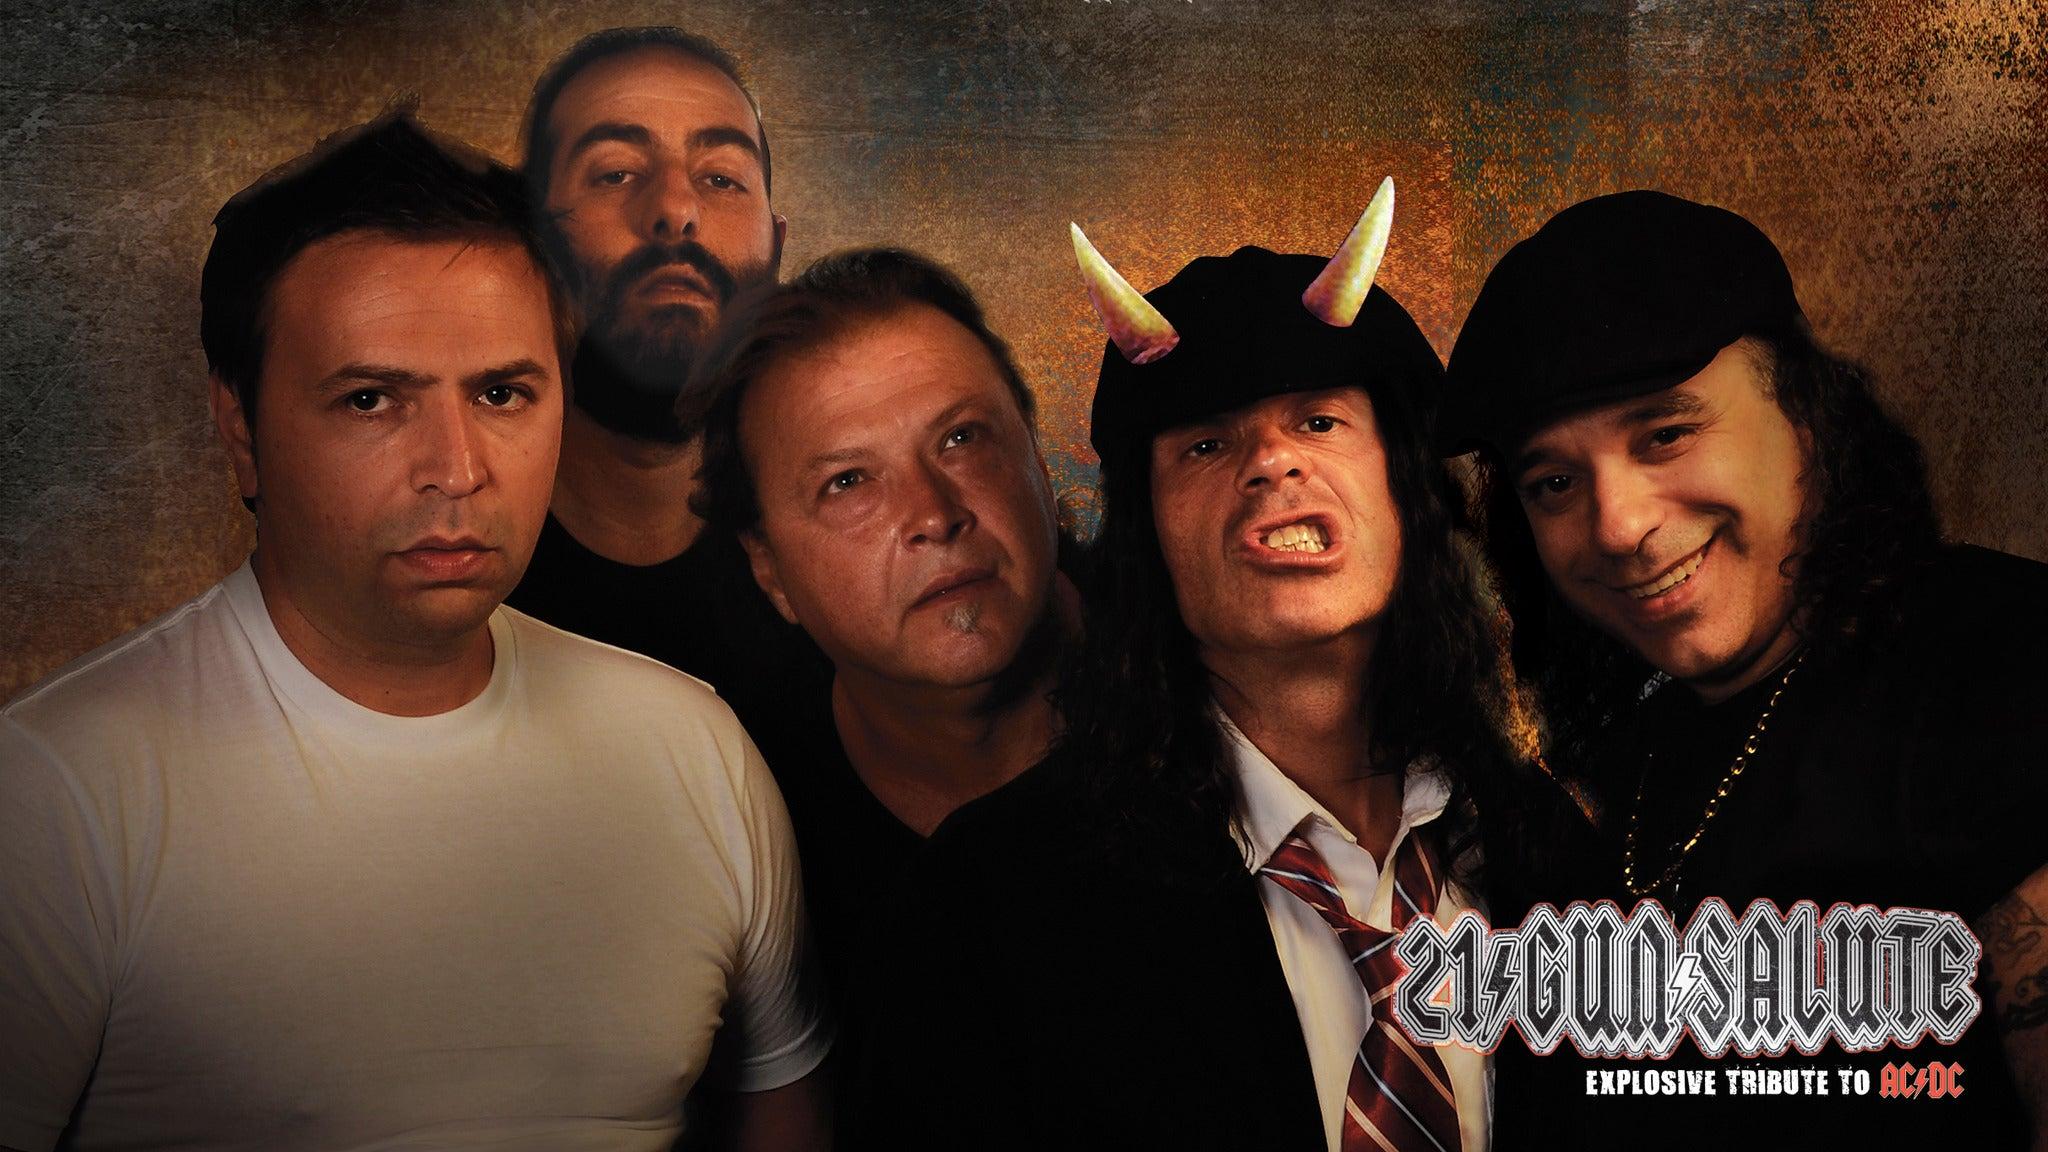 21 Gun Salute: An Explosive Tribute To AC/DC